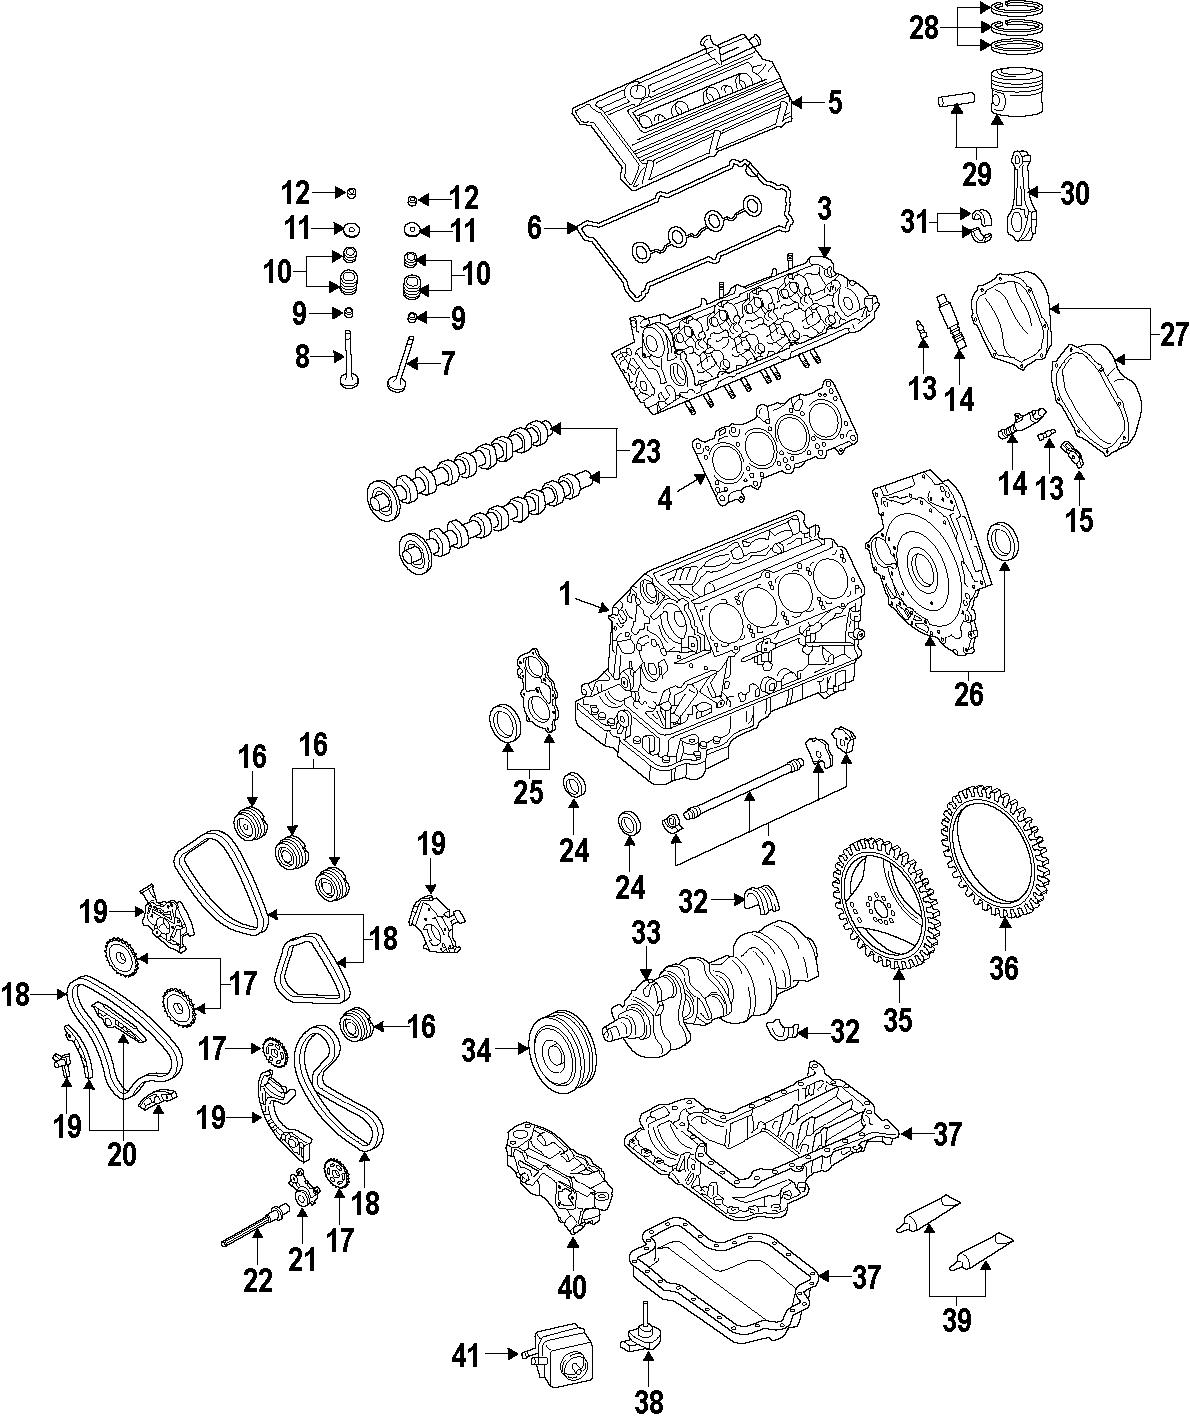 Audi A8 Engine Mount  Rear  - 4e0199381fl